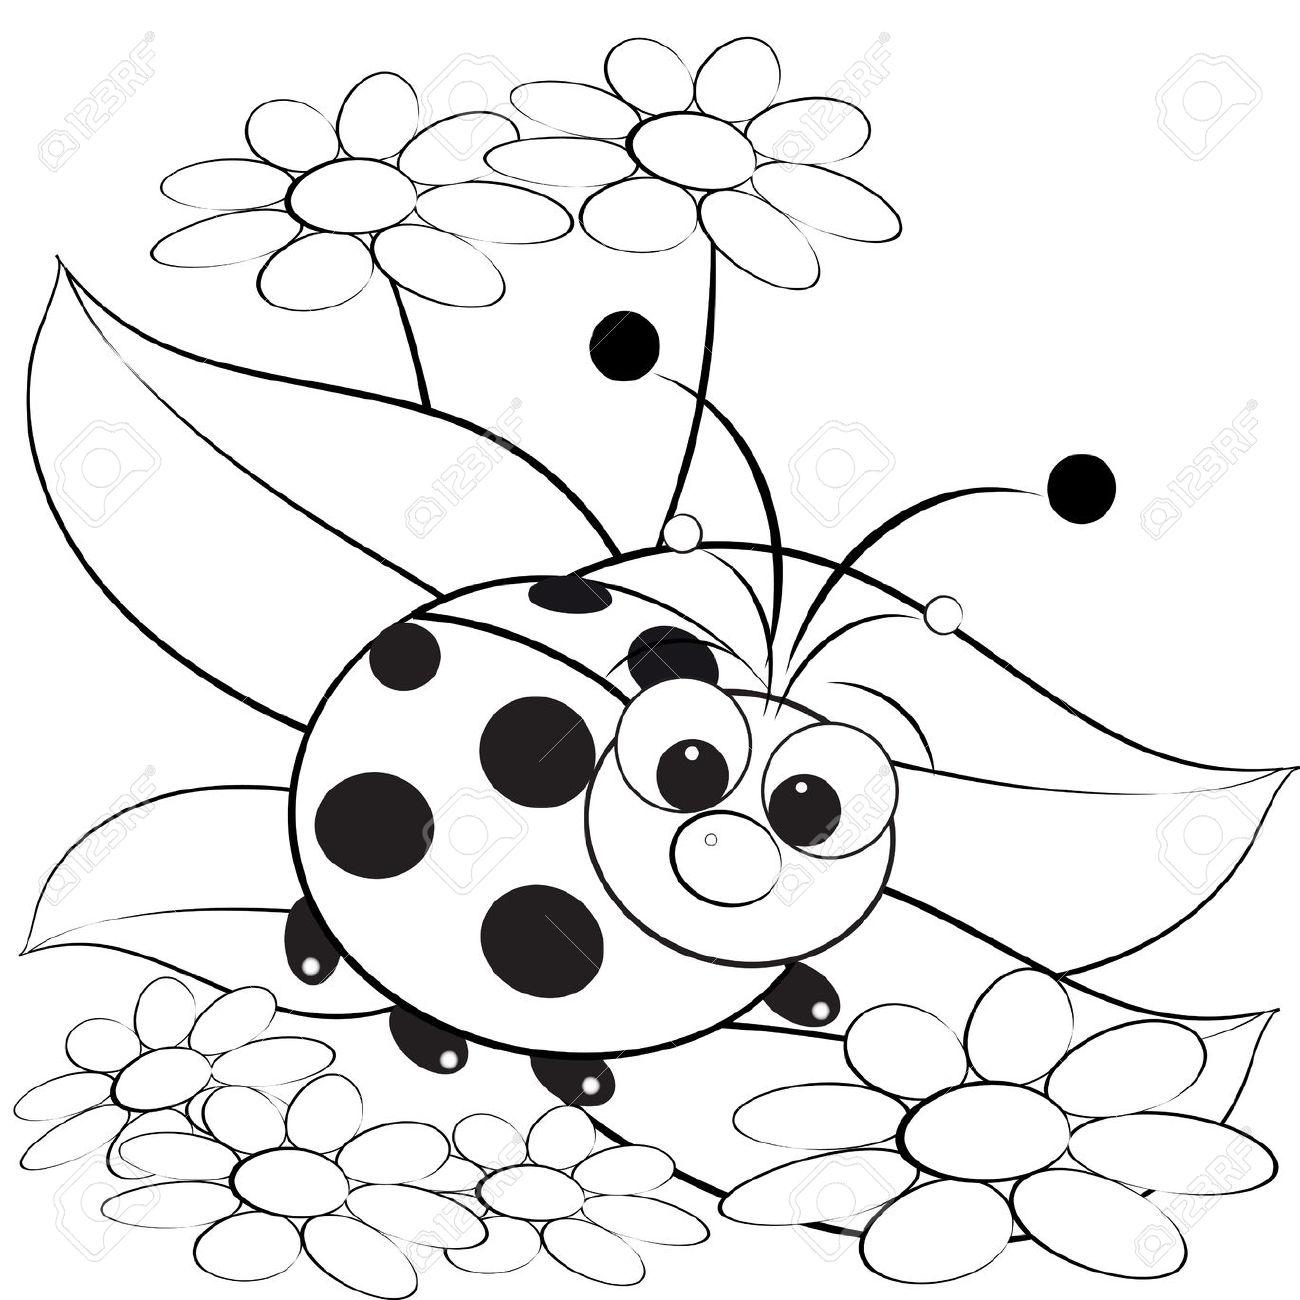 Ladybug Drawing For Kids At Getdrawings